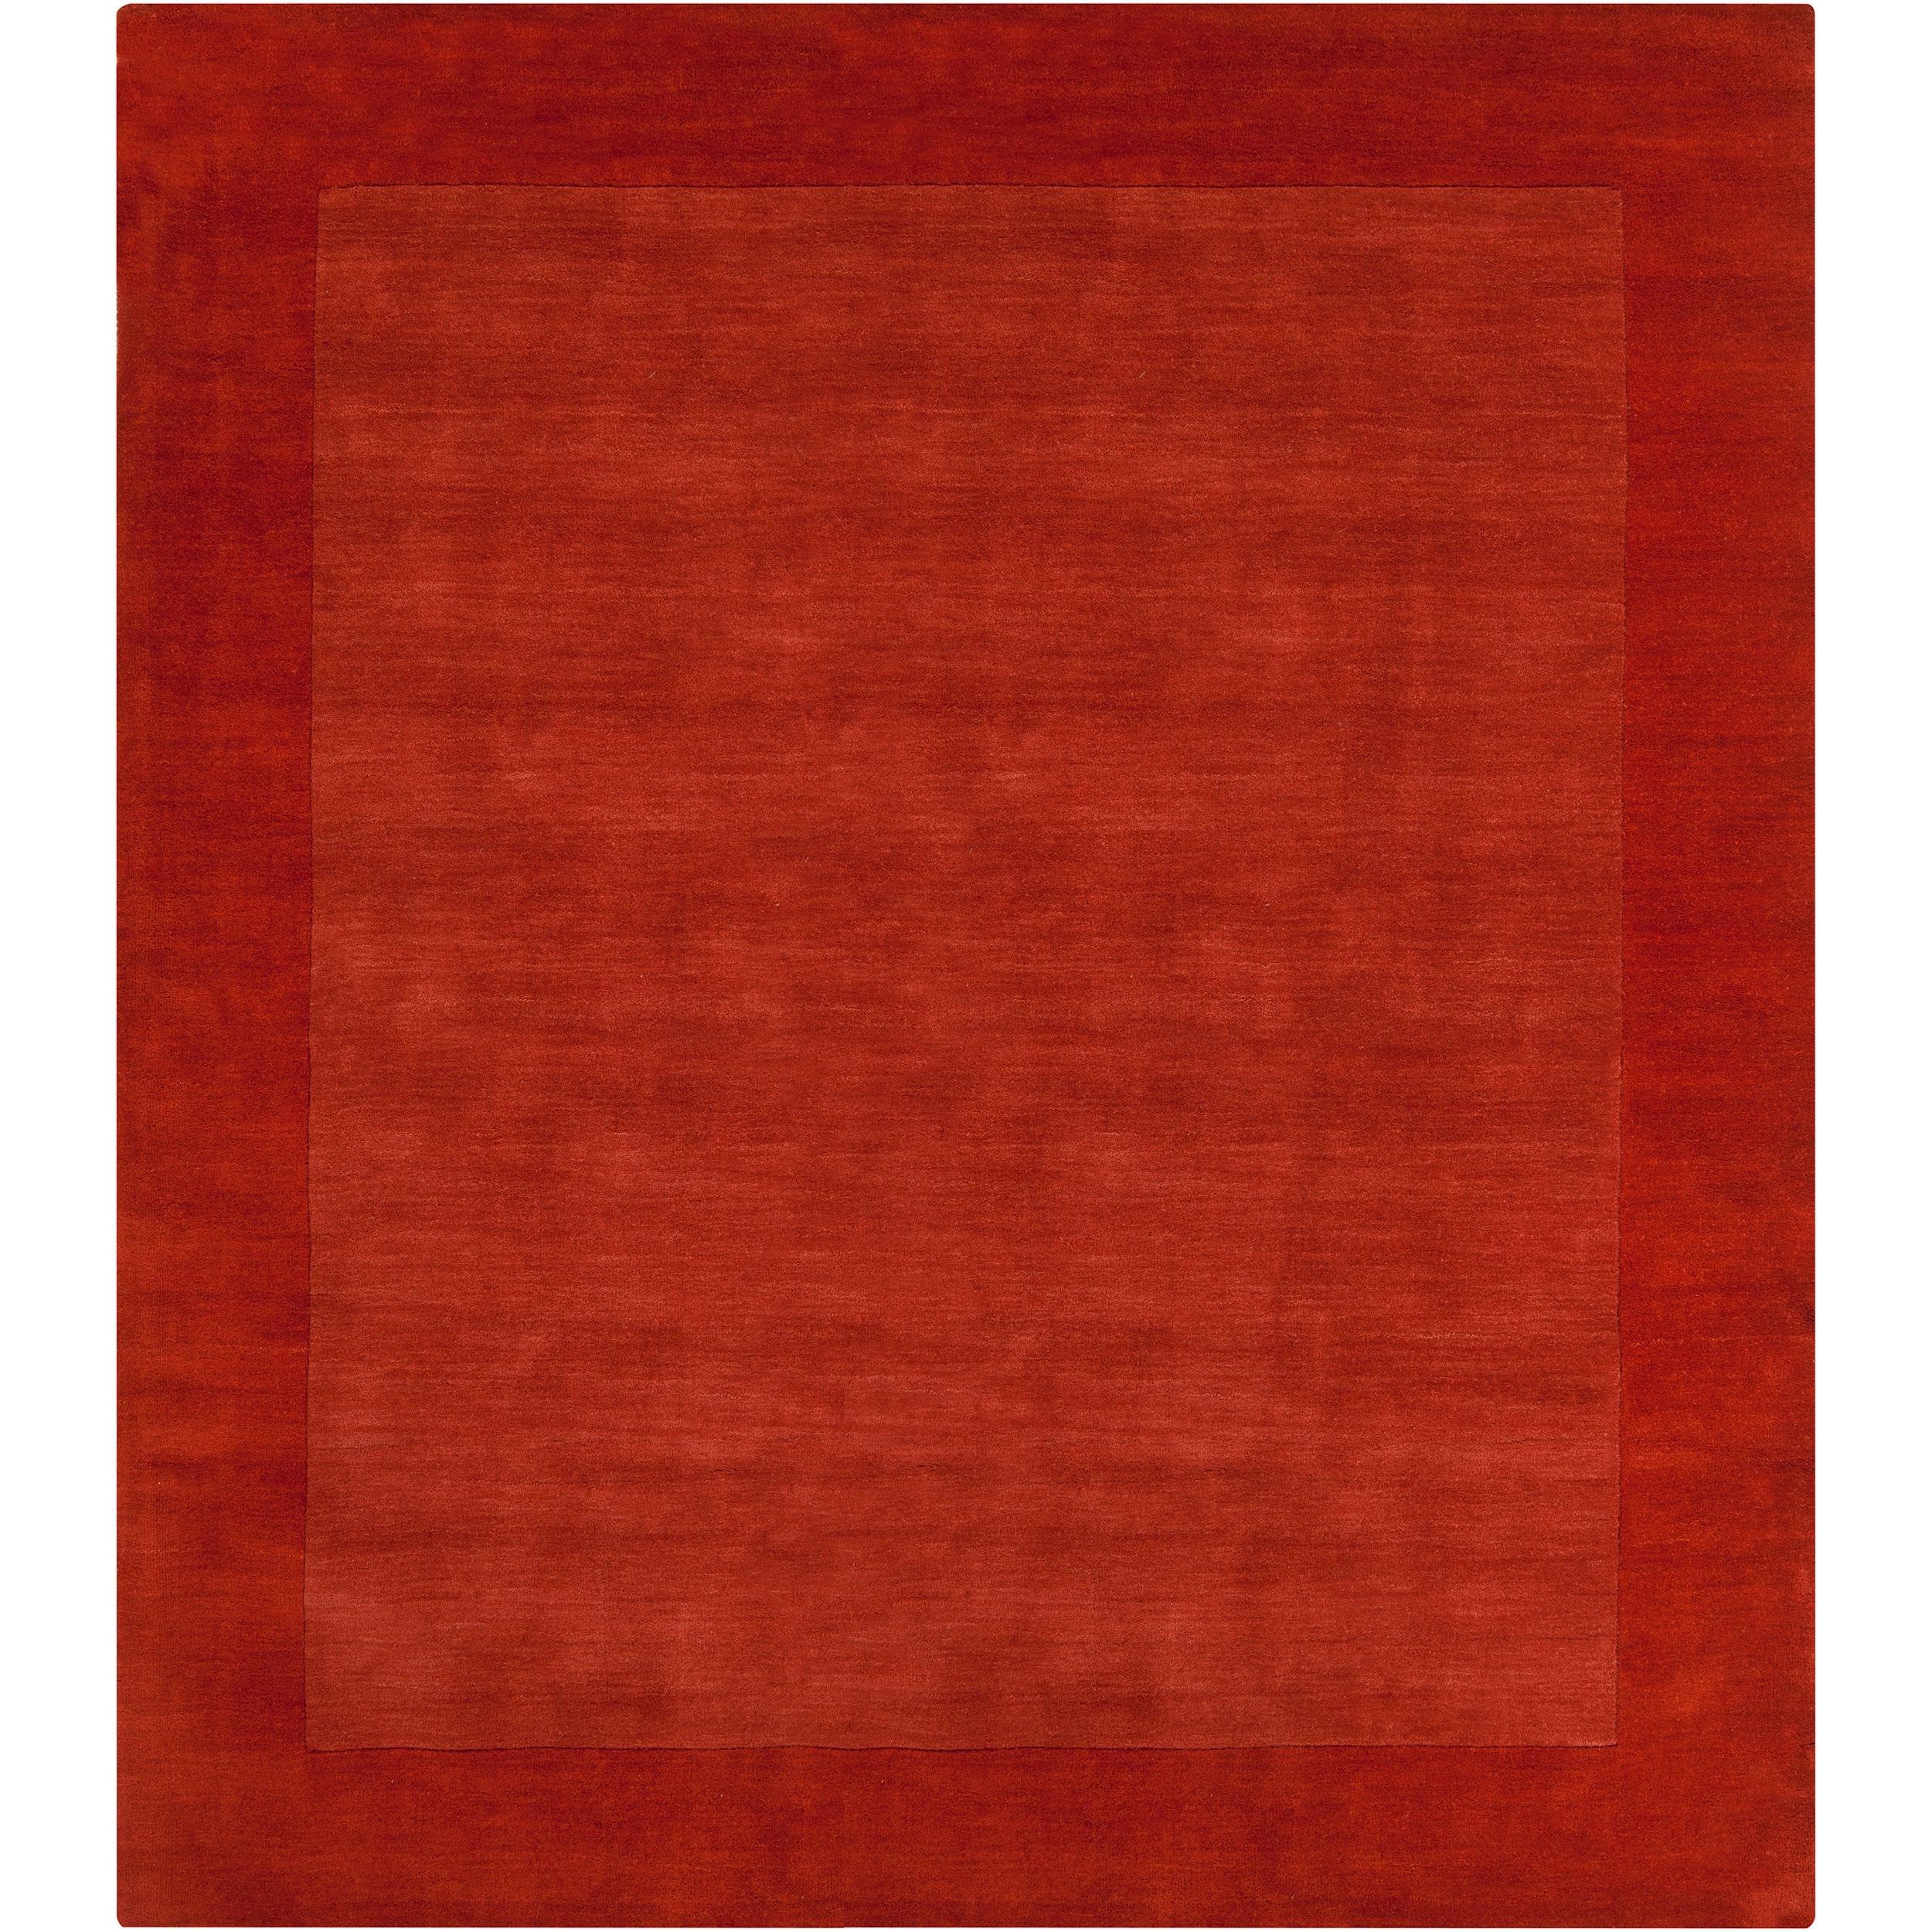 Hand-crafted Orange Tone-On-Tone Bordered Pechora Wool Rug (8' Square)